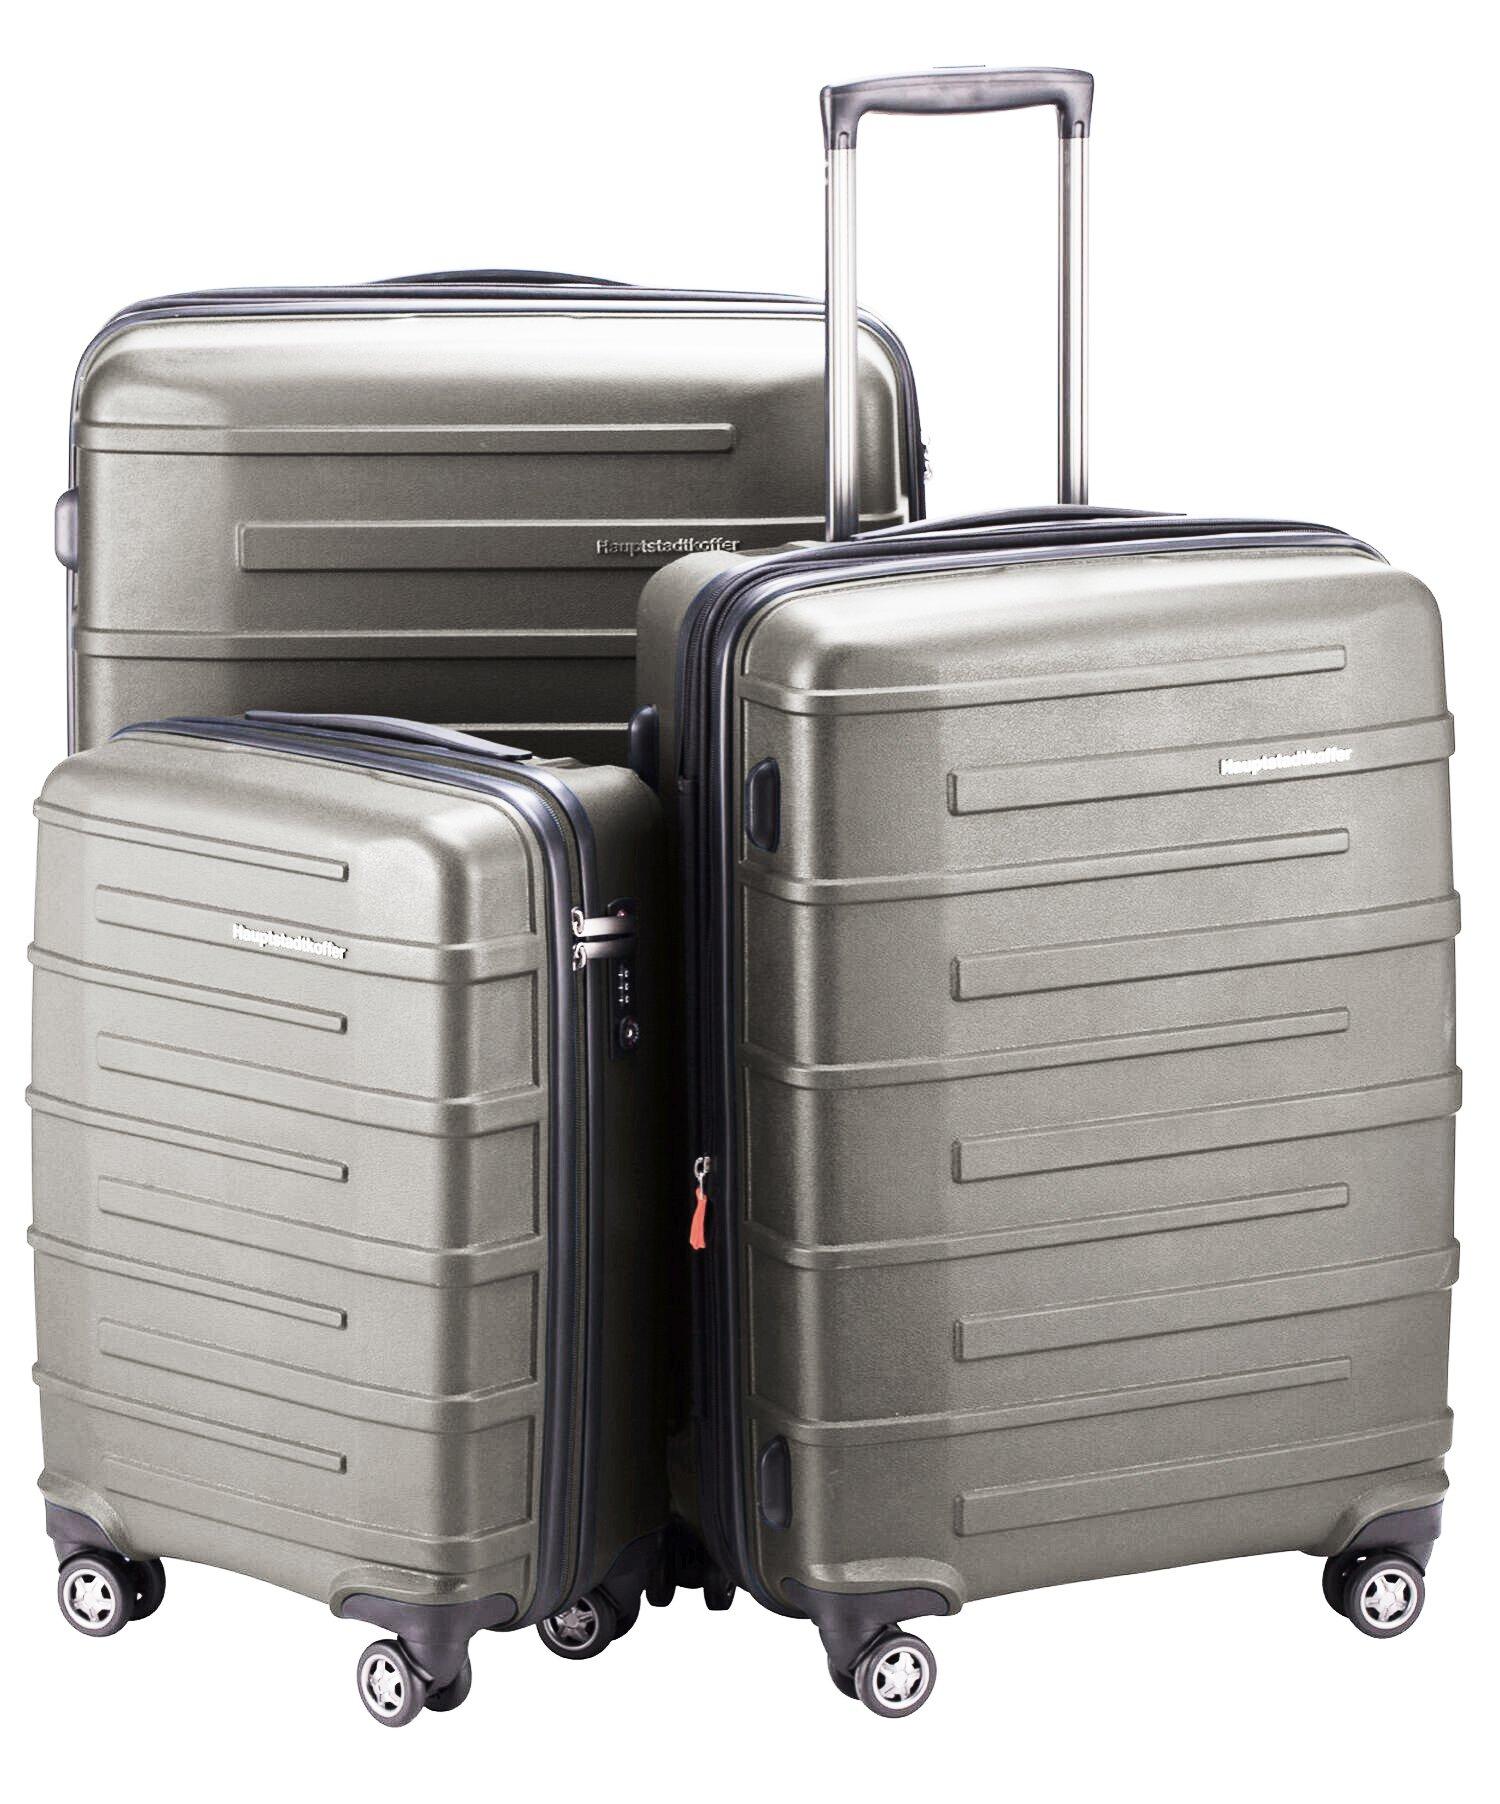 HAUPTSTADTKOFFER Ostkreuz Luggages Set Matt Suitcase Set Hardside Spinner Trolley Expandable (20', 24'& 28') TSA Graphite